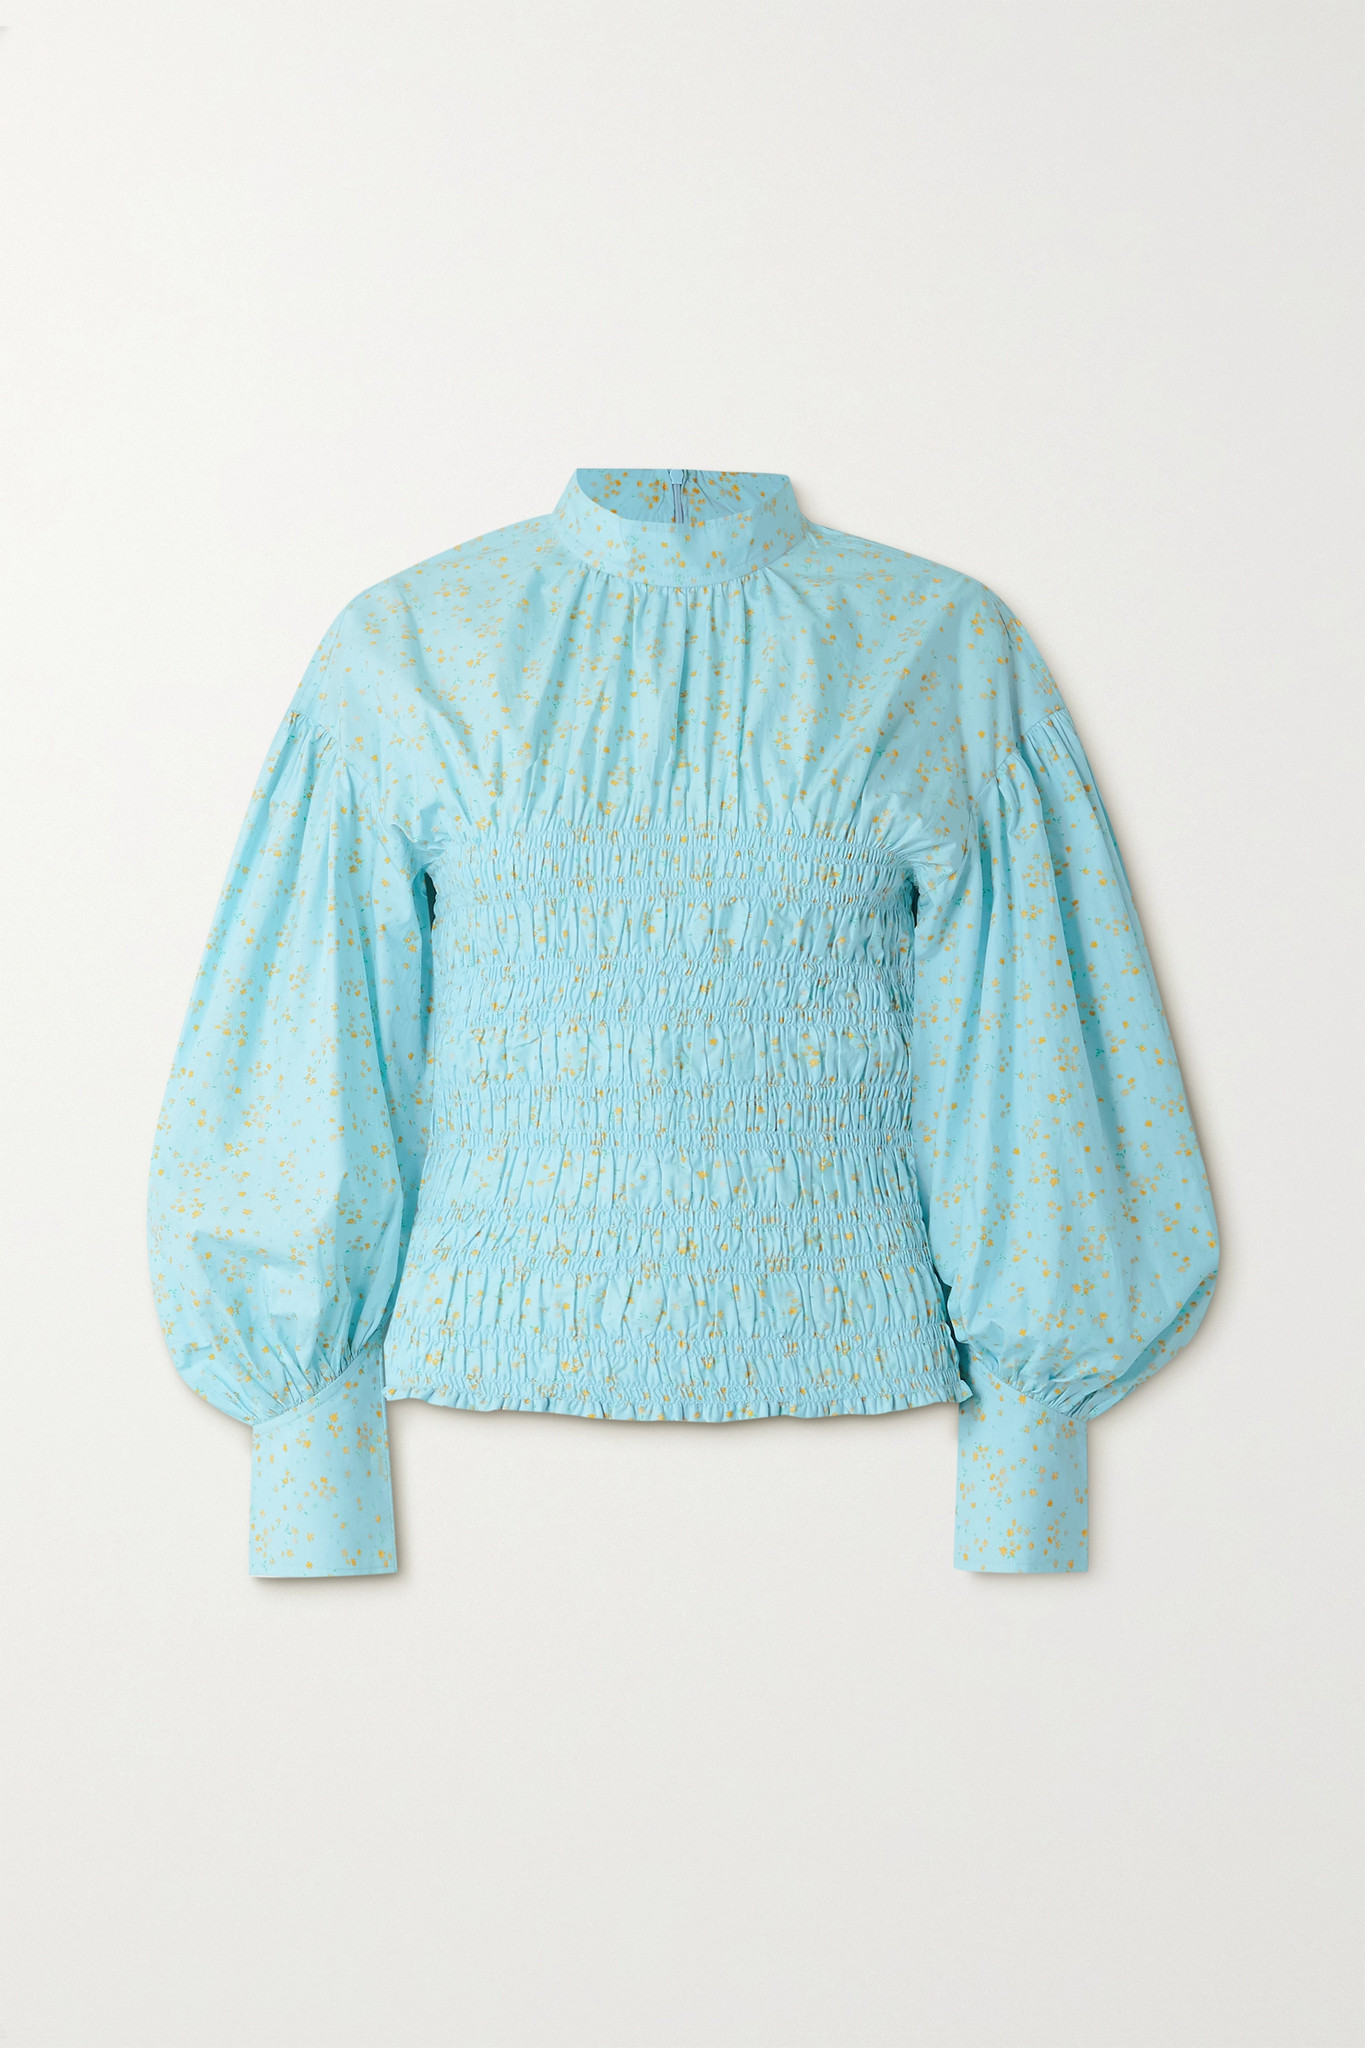 GANNI - Shirred Floral-print Organic Cotton-blend Poplin Blouse - Blue - DK40